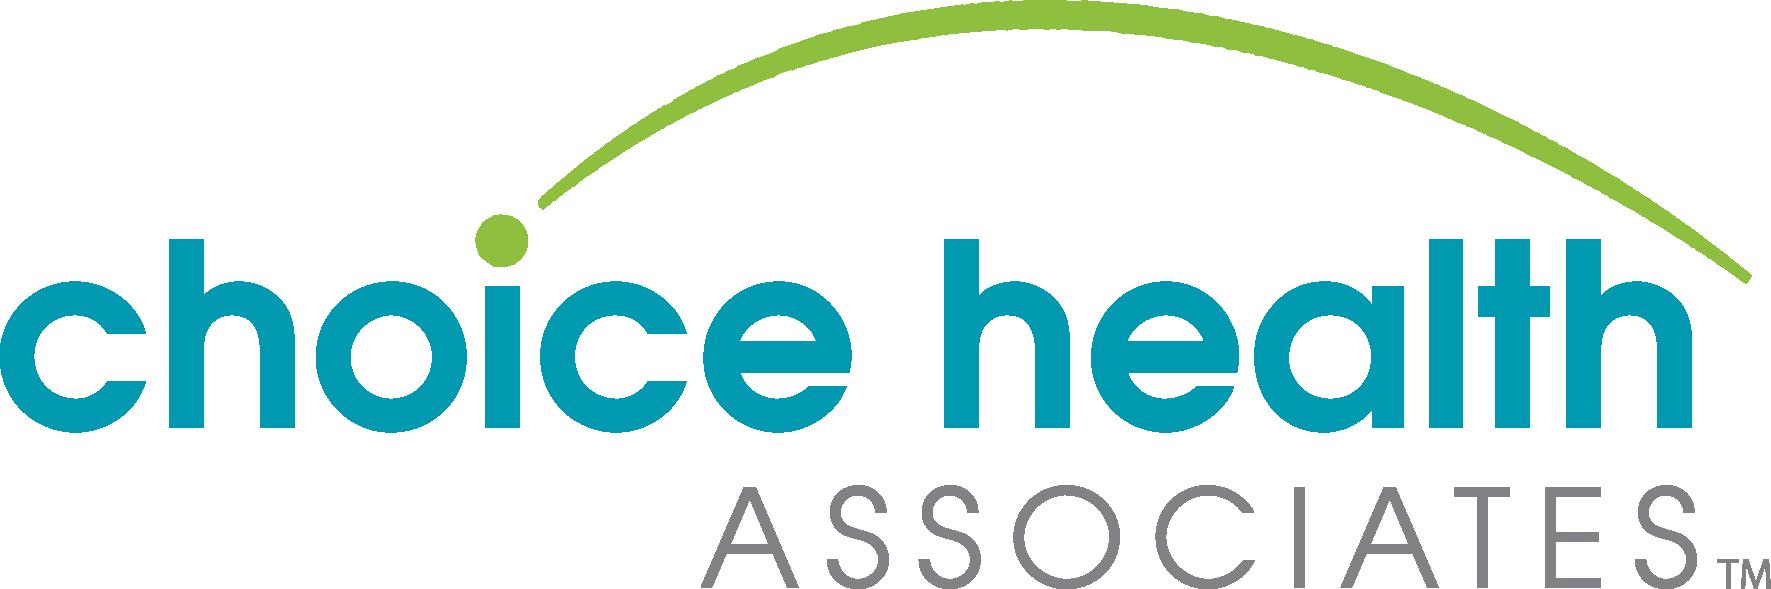 Choice Health Associates Logo